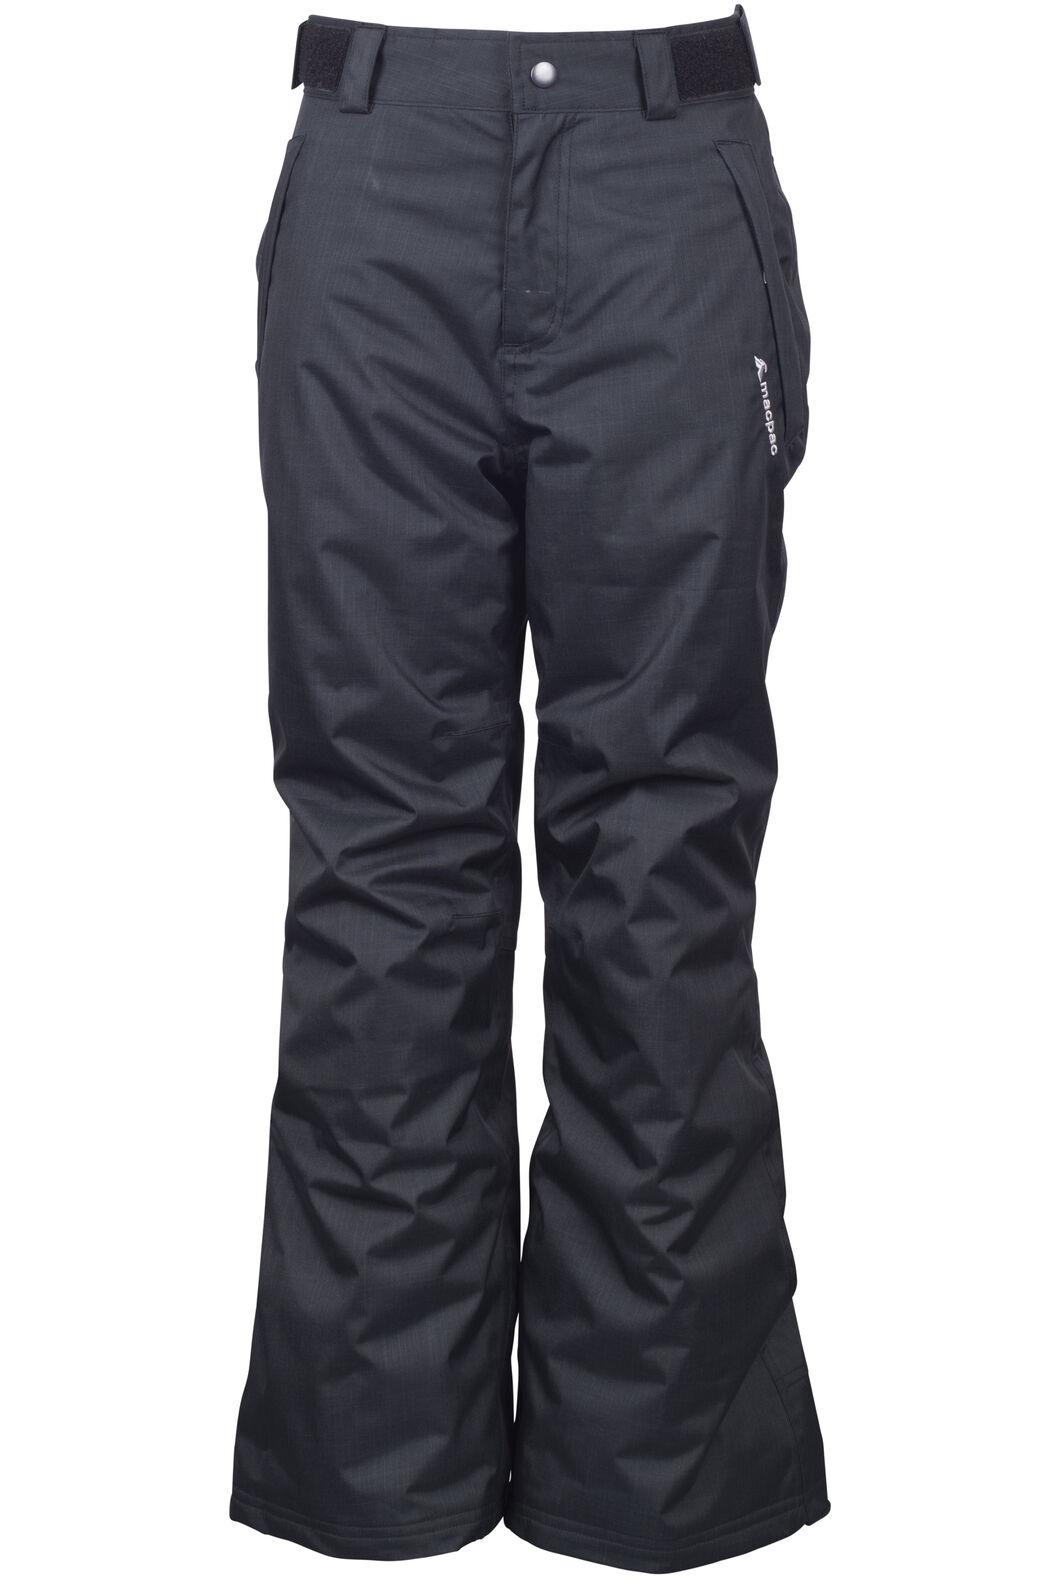 Macpac Spree Ski Pants - Kids', Black, hi-res